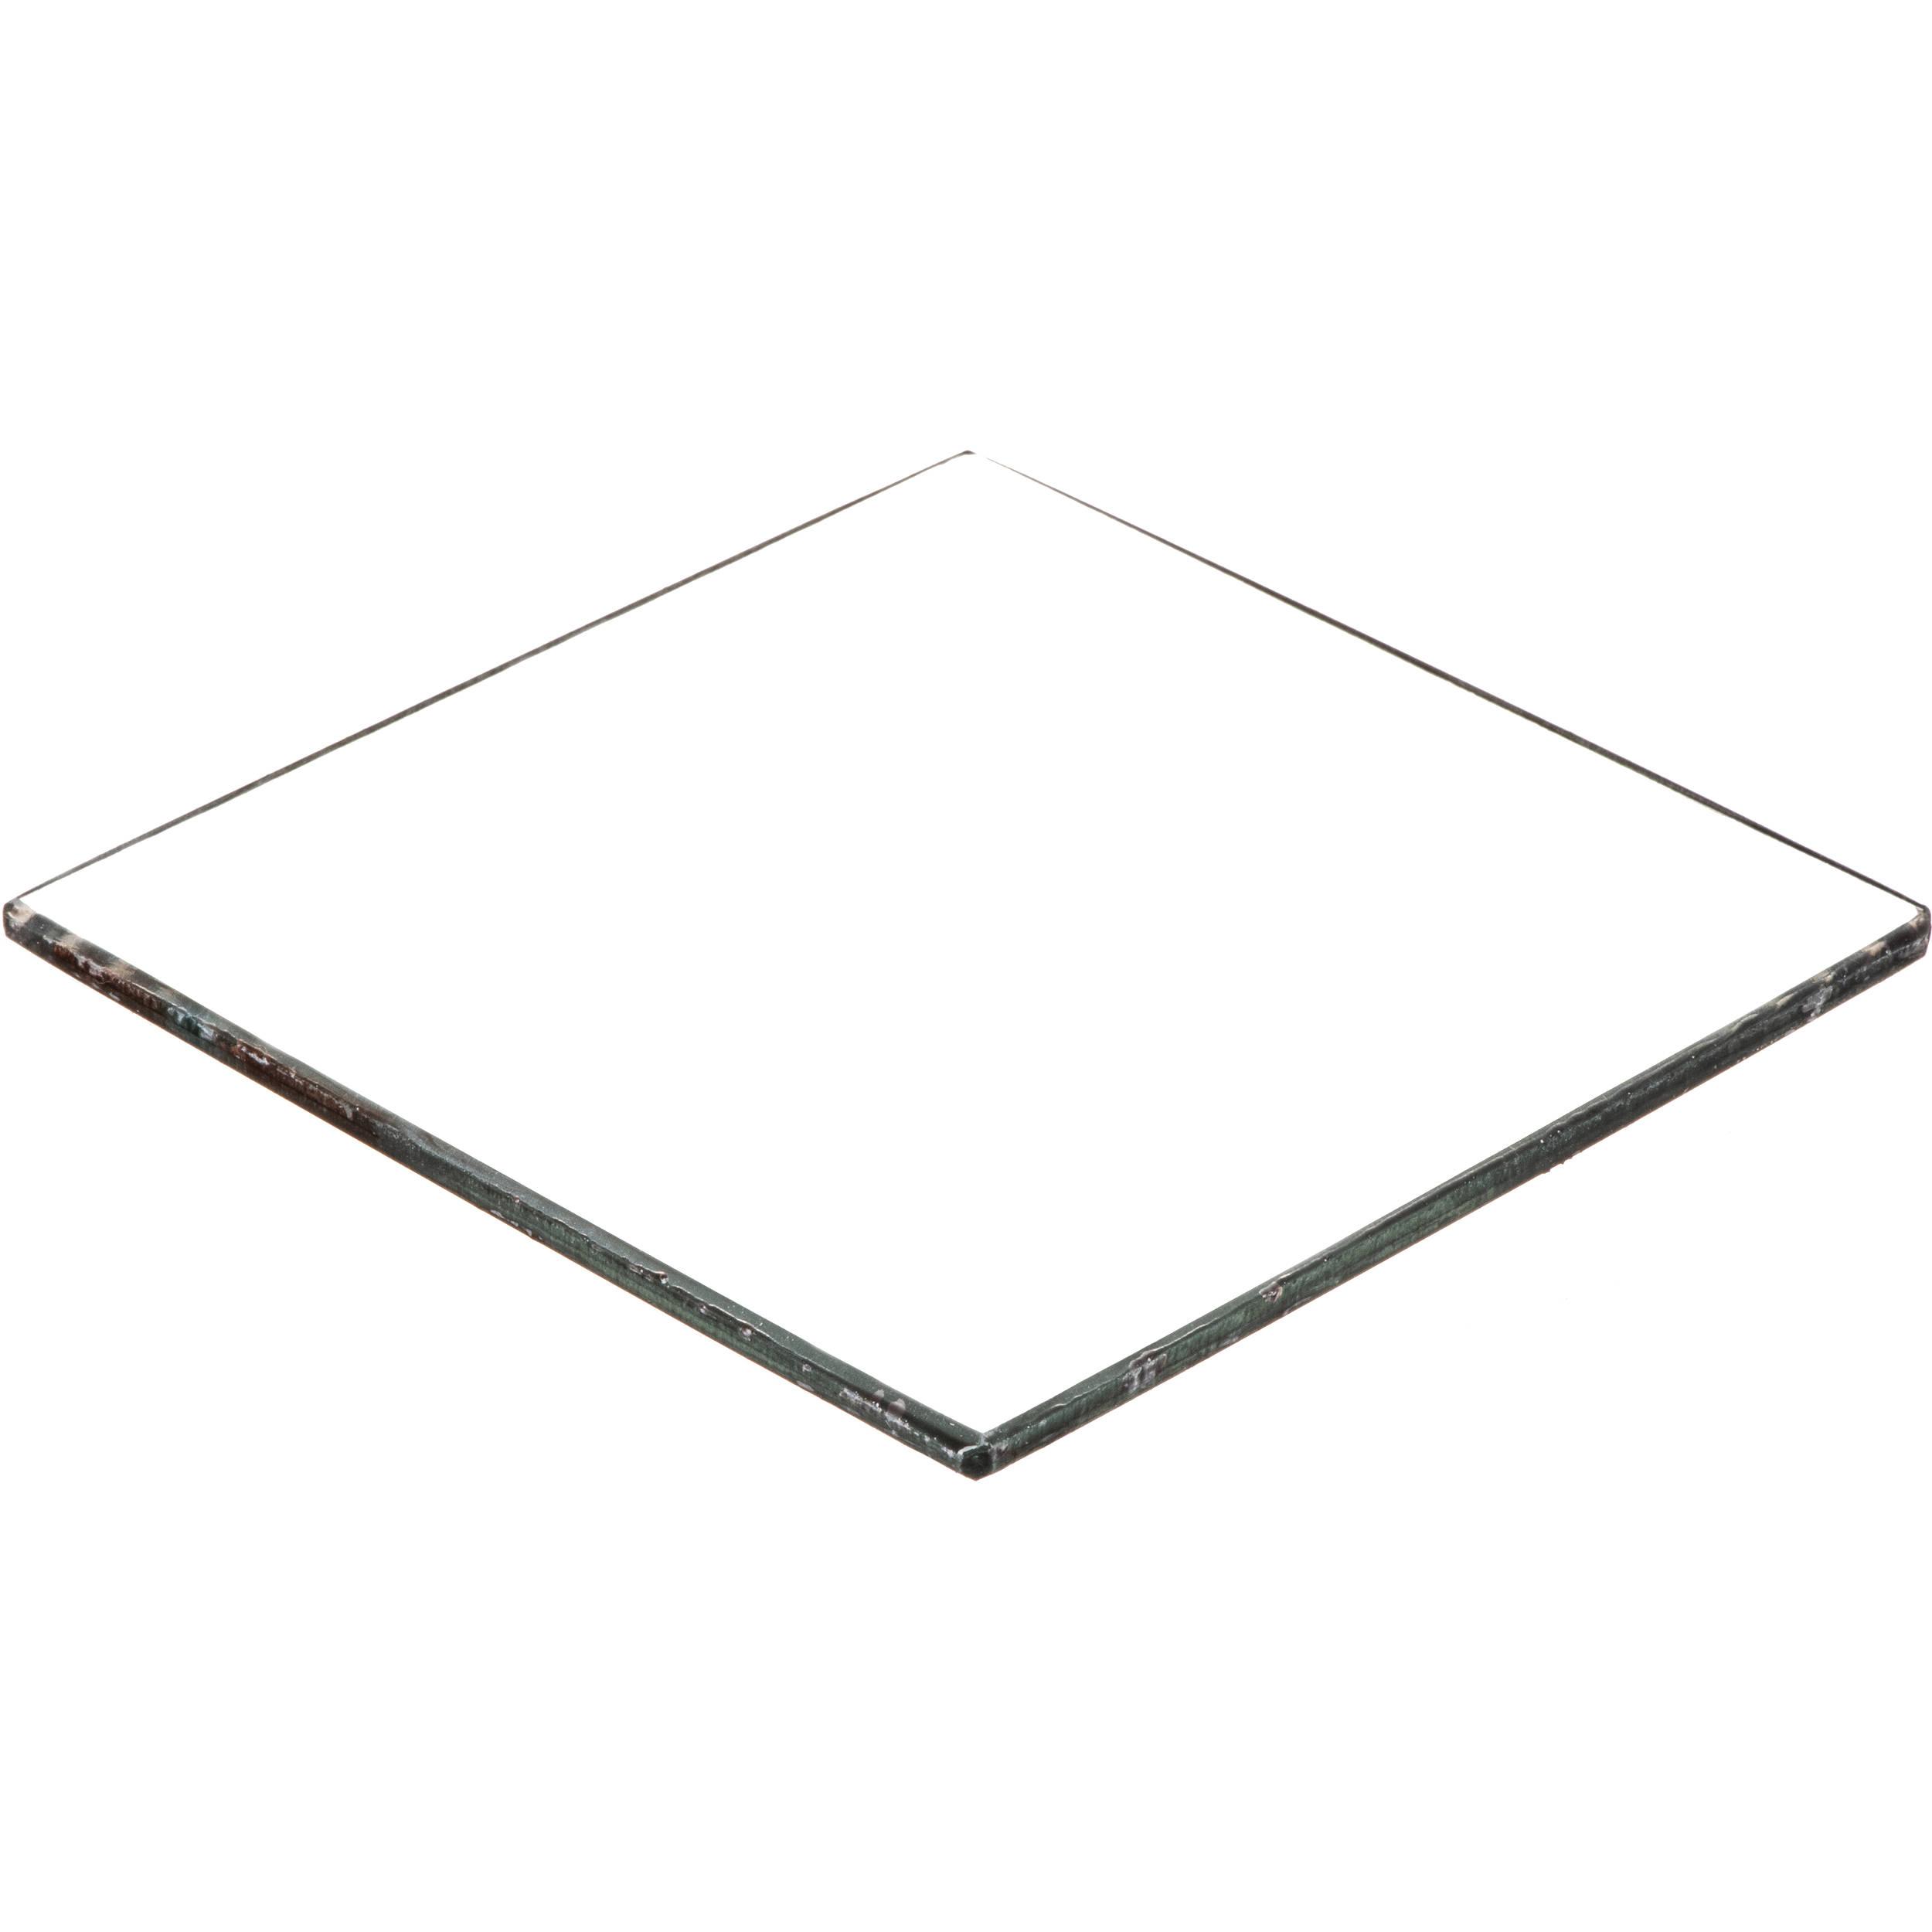 Tiffen - Filtro Pro-Mist 1/4, 49 mm: Amazon.it: Elettronica